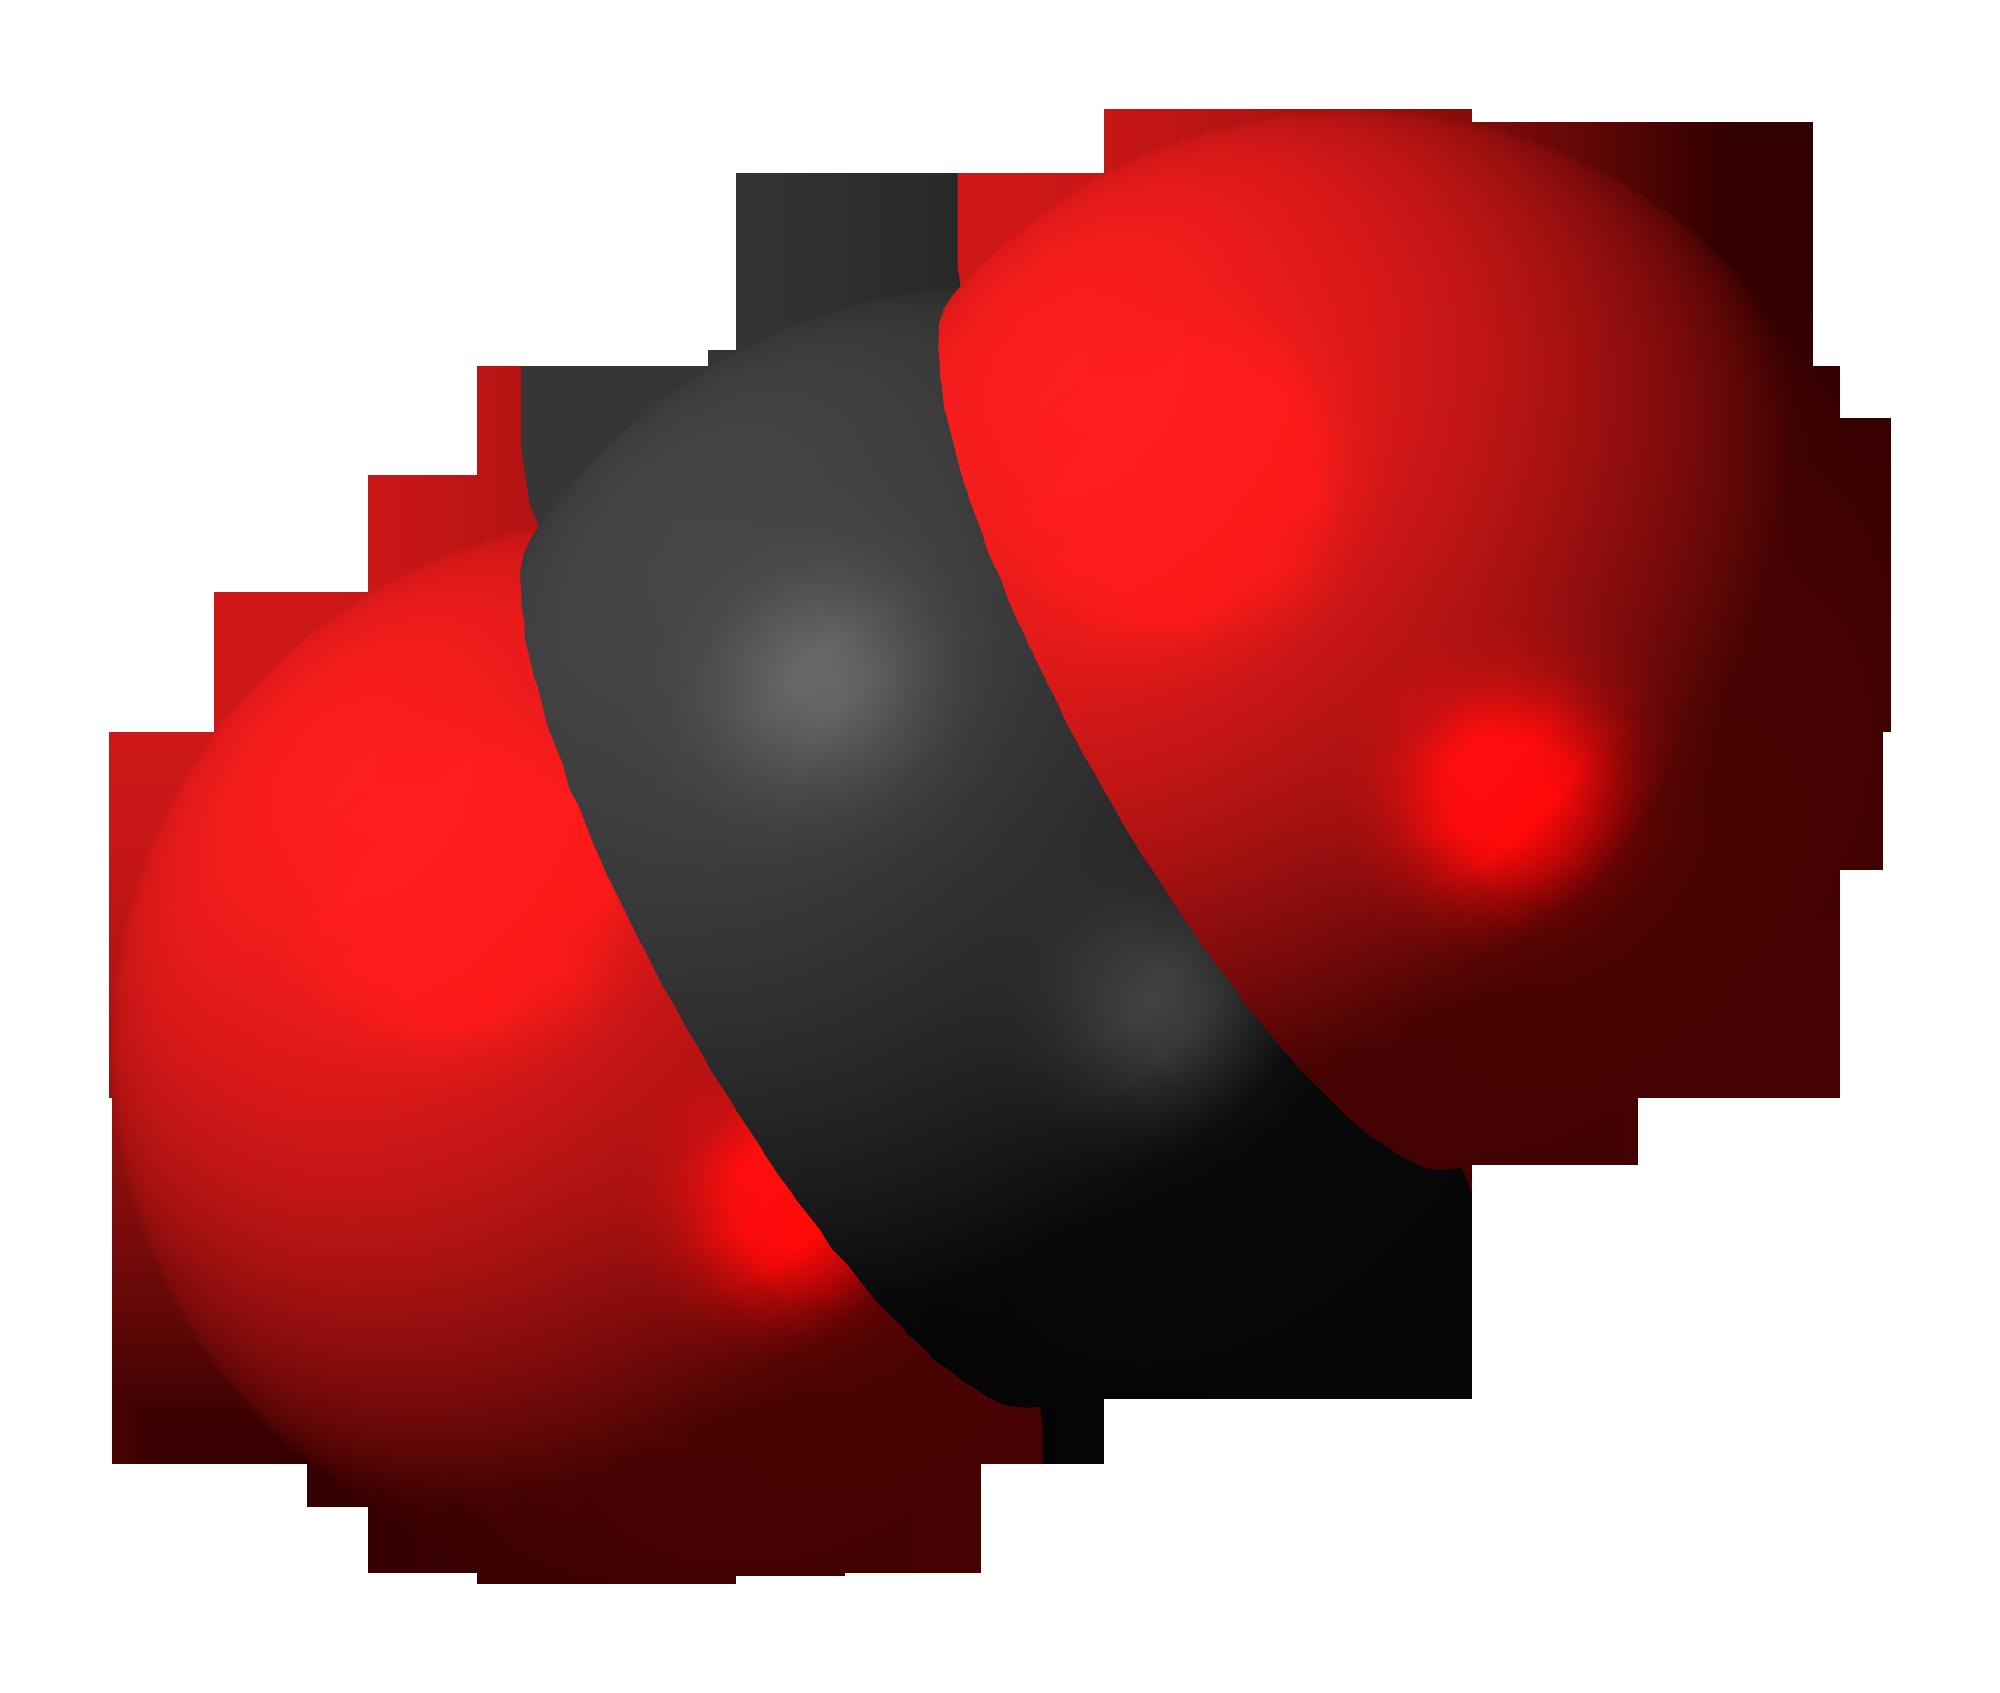 Space-filling model of carbon dioxide